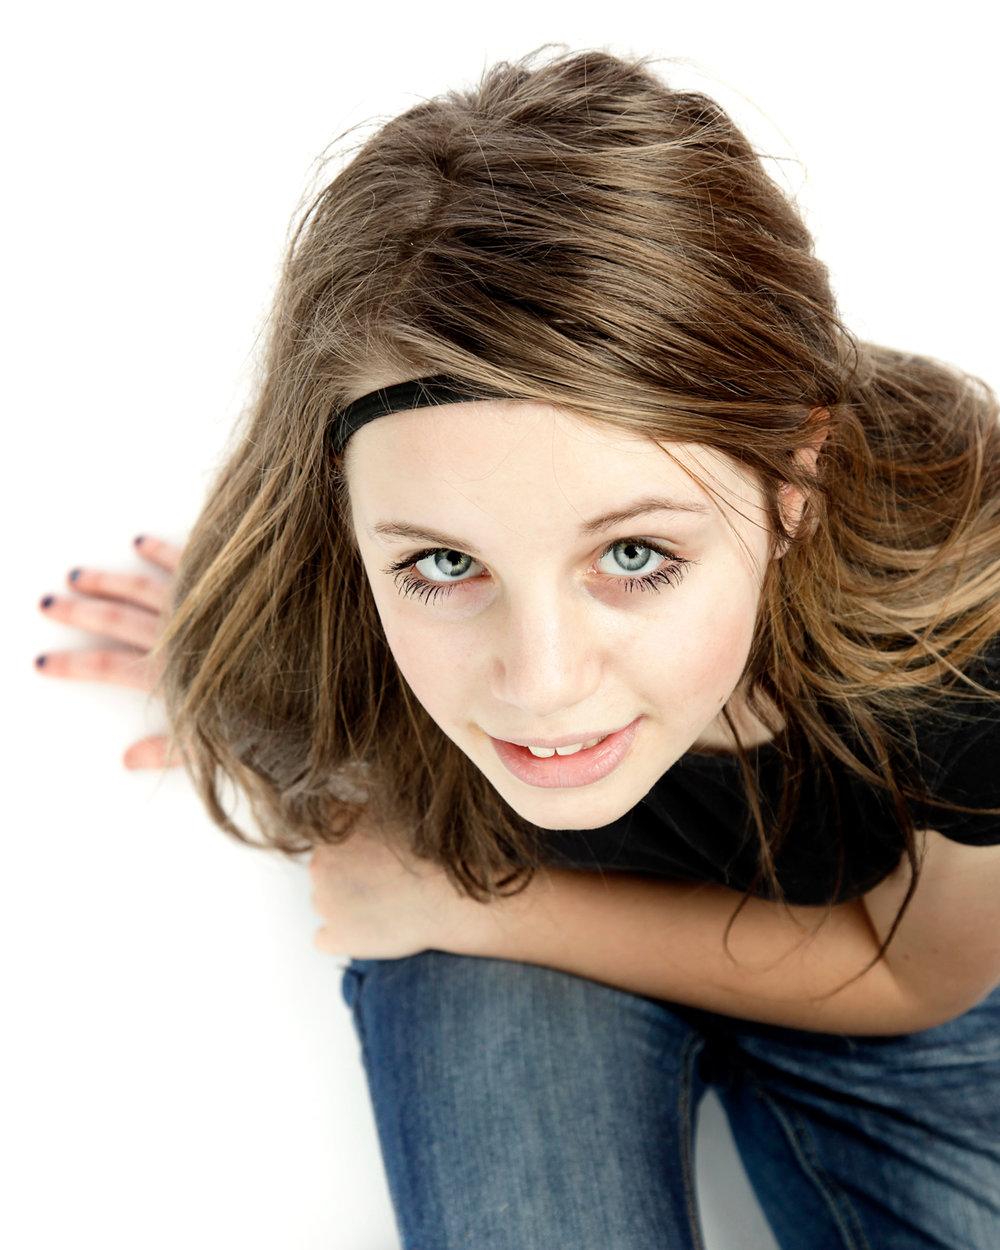 Teen_Portrait_Photographer_Newbury_Berkshire_027.jpg